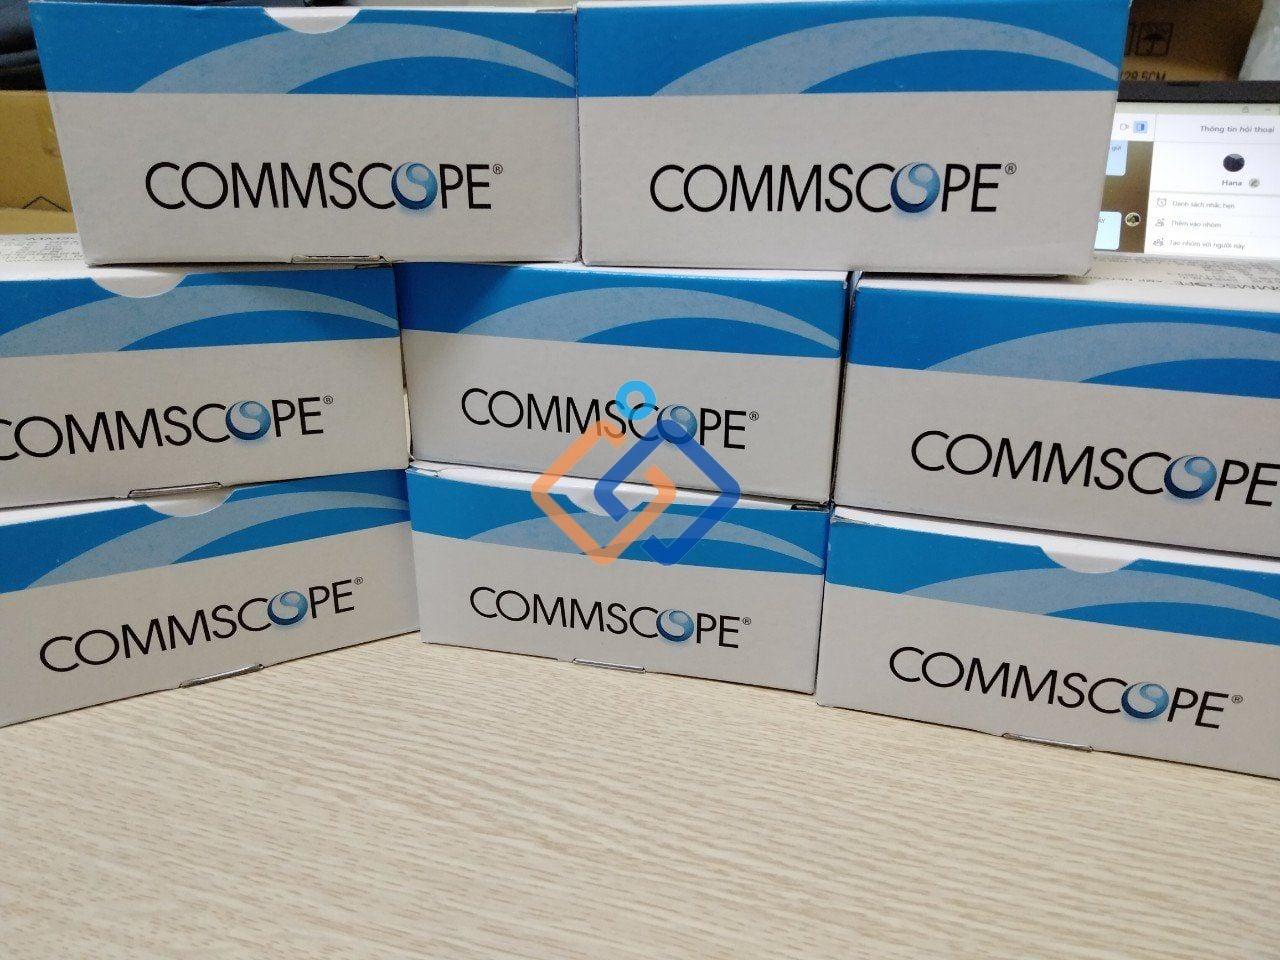 hat-mang-cat6-amp-commscope